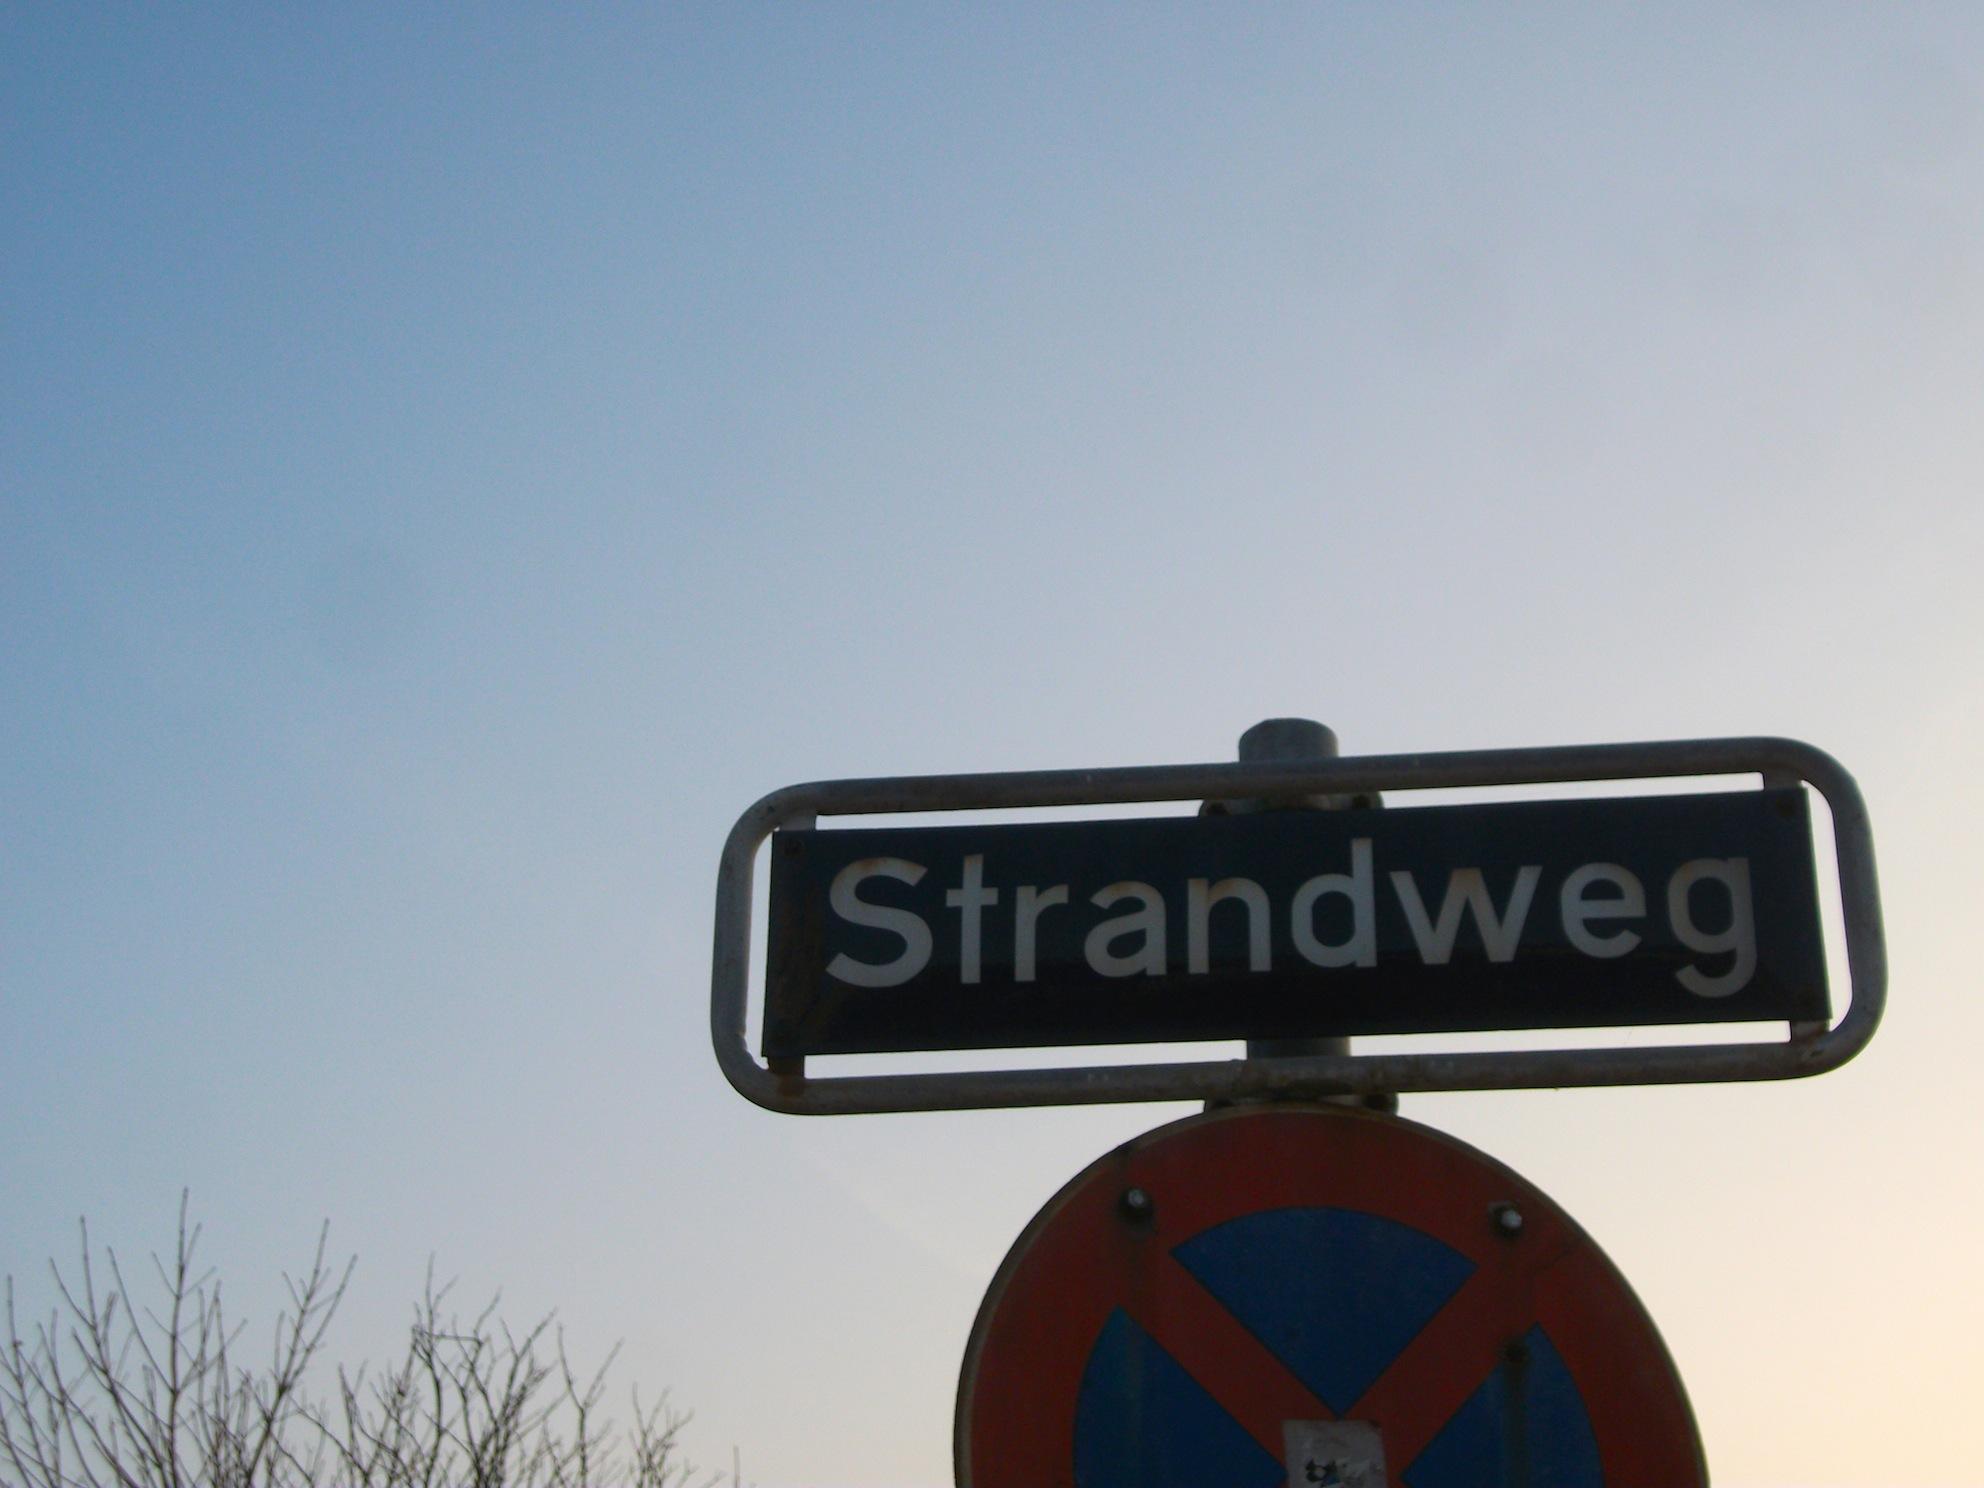 Strandweg an der Elbe